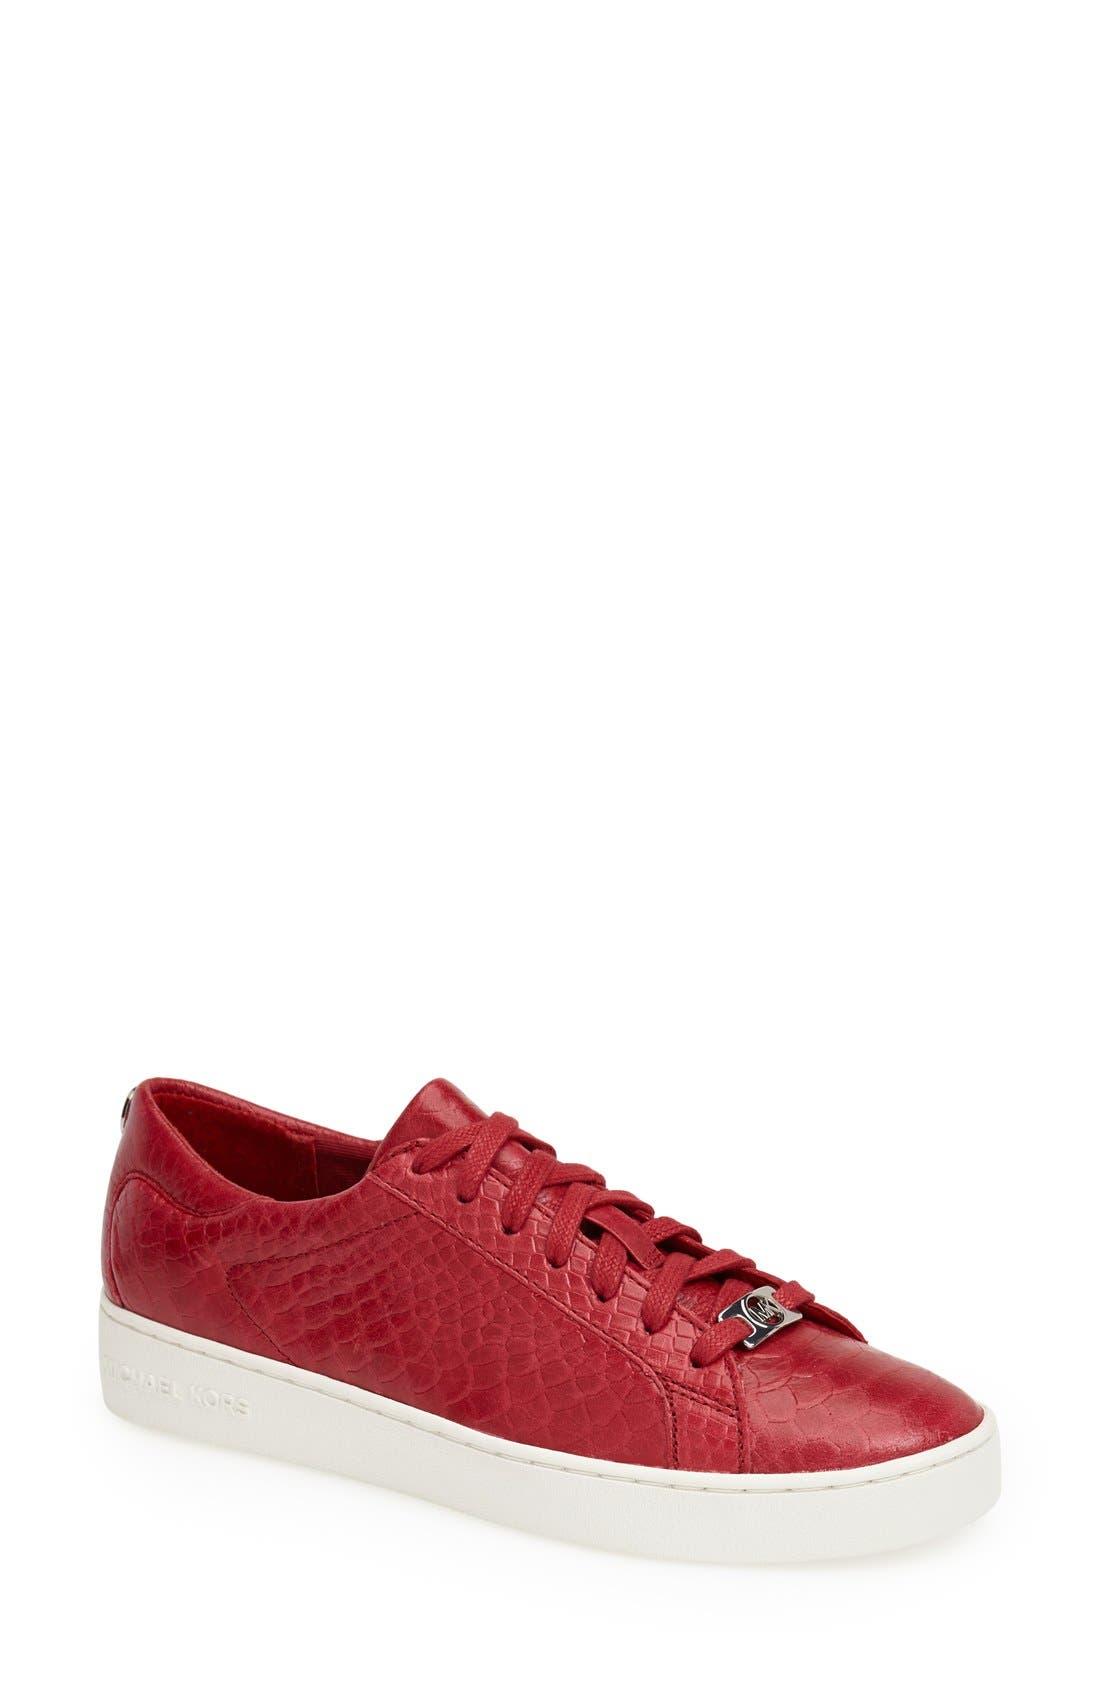 'Keaton' Sneaker,                             Main thumbnail 1, color,                             Scarlet